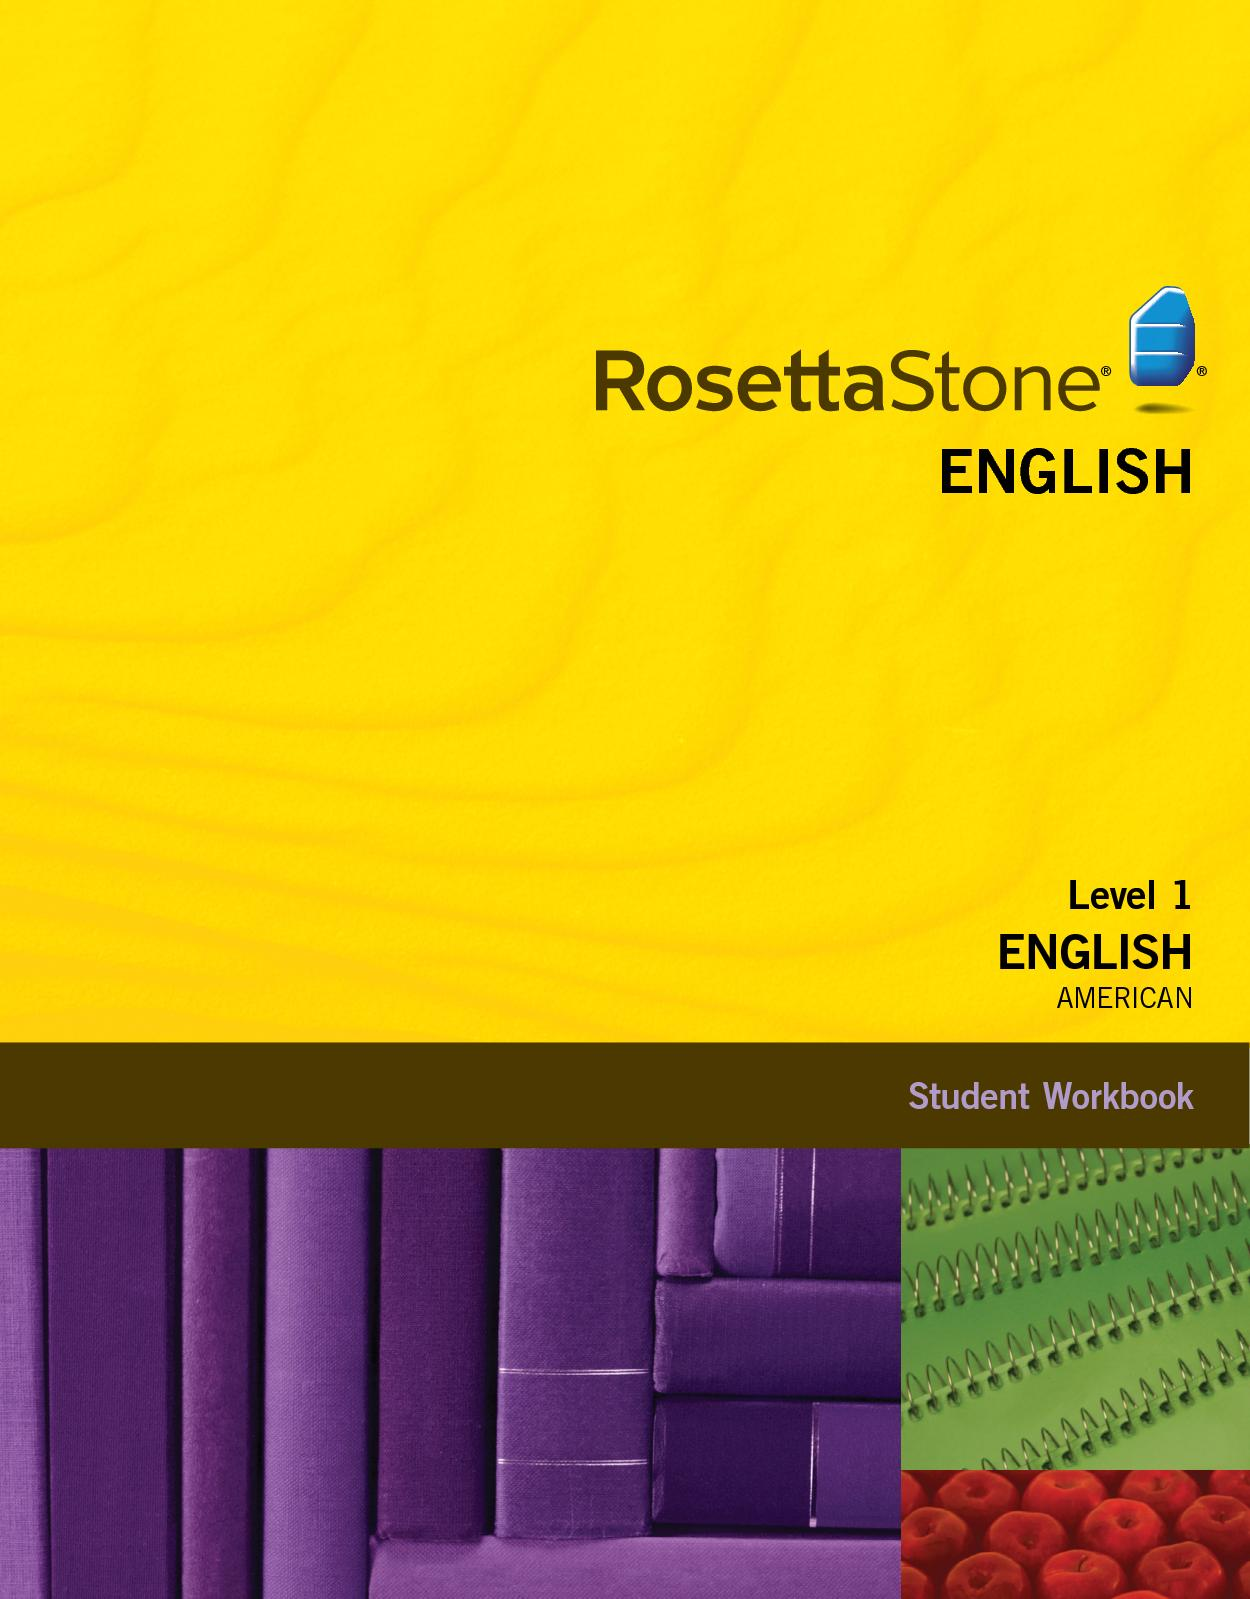 Calamo 2 Student Workbook English American Level 1